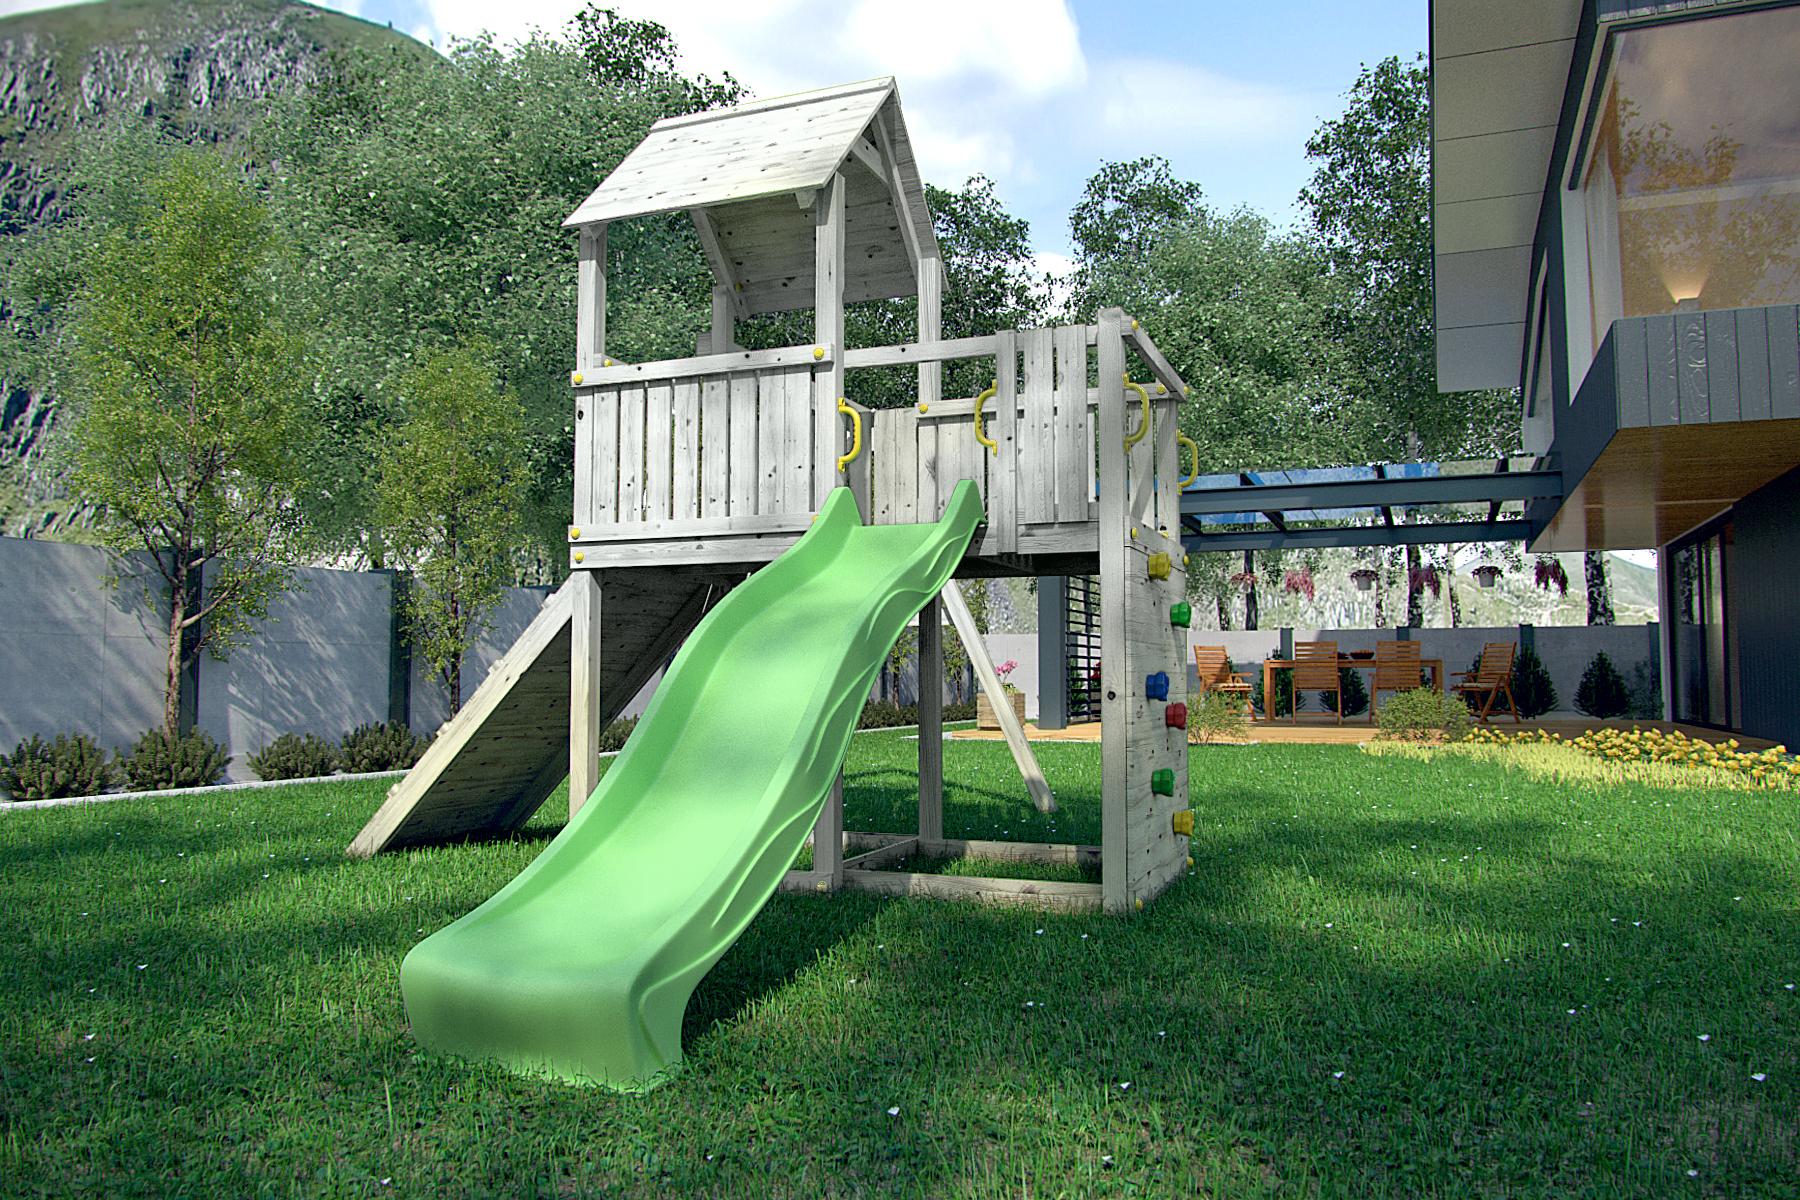 przydomowy plac zabaw dla dzieci carol 3b. Black Bedroom Furniture Sets. Home Design Ideas